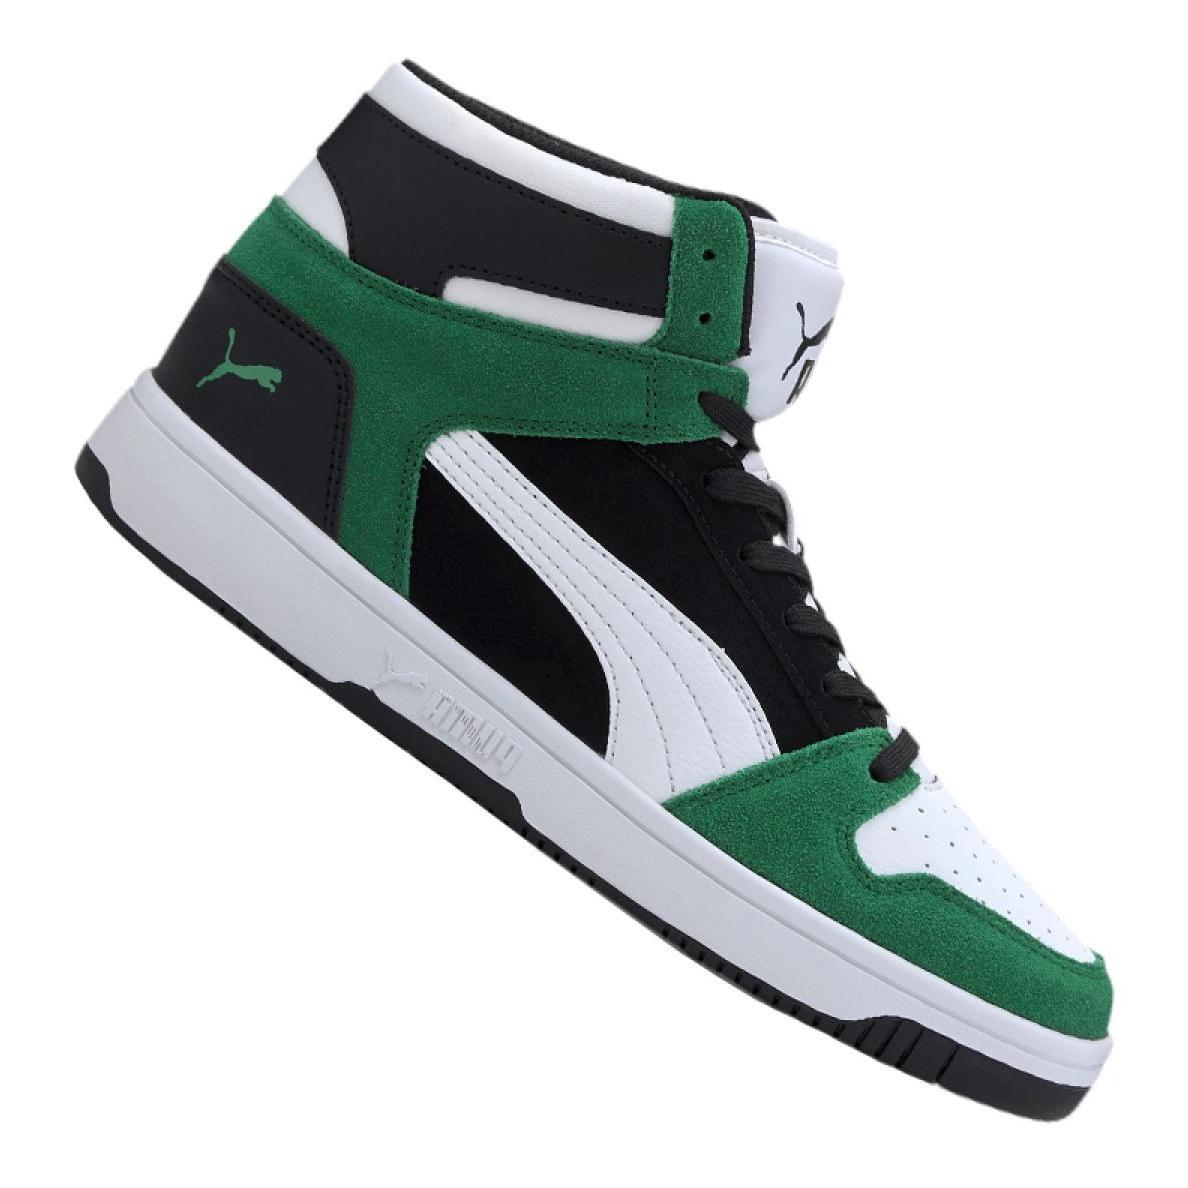 Puma Rebound LayUp Sd M 370219-05 white black green